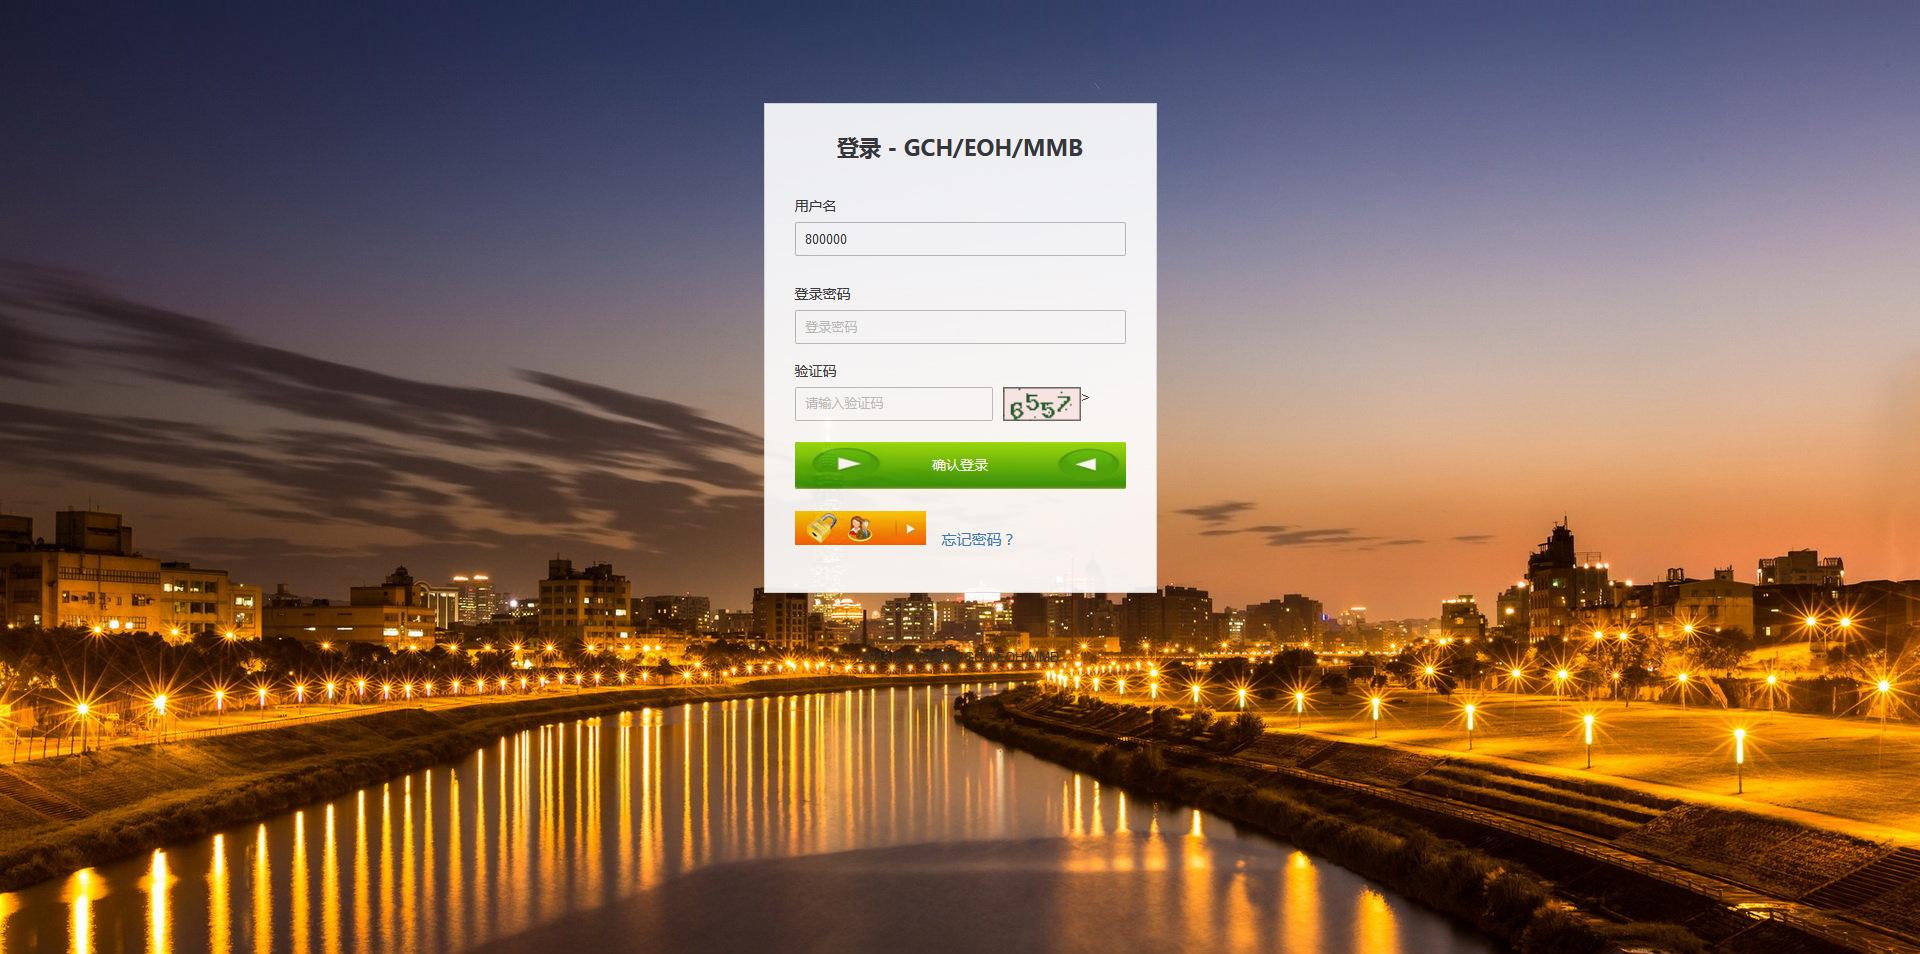 【MMB金融盘】全功能版GCH资金盘理财源码-找主题源码